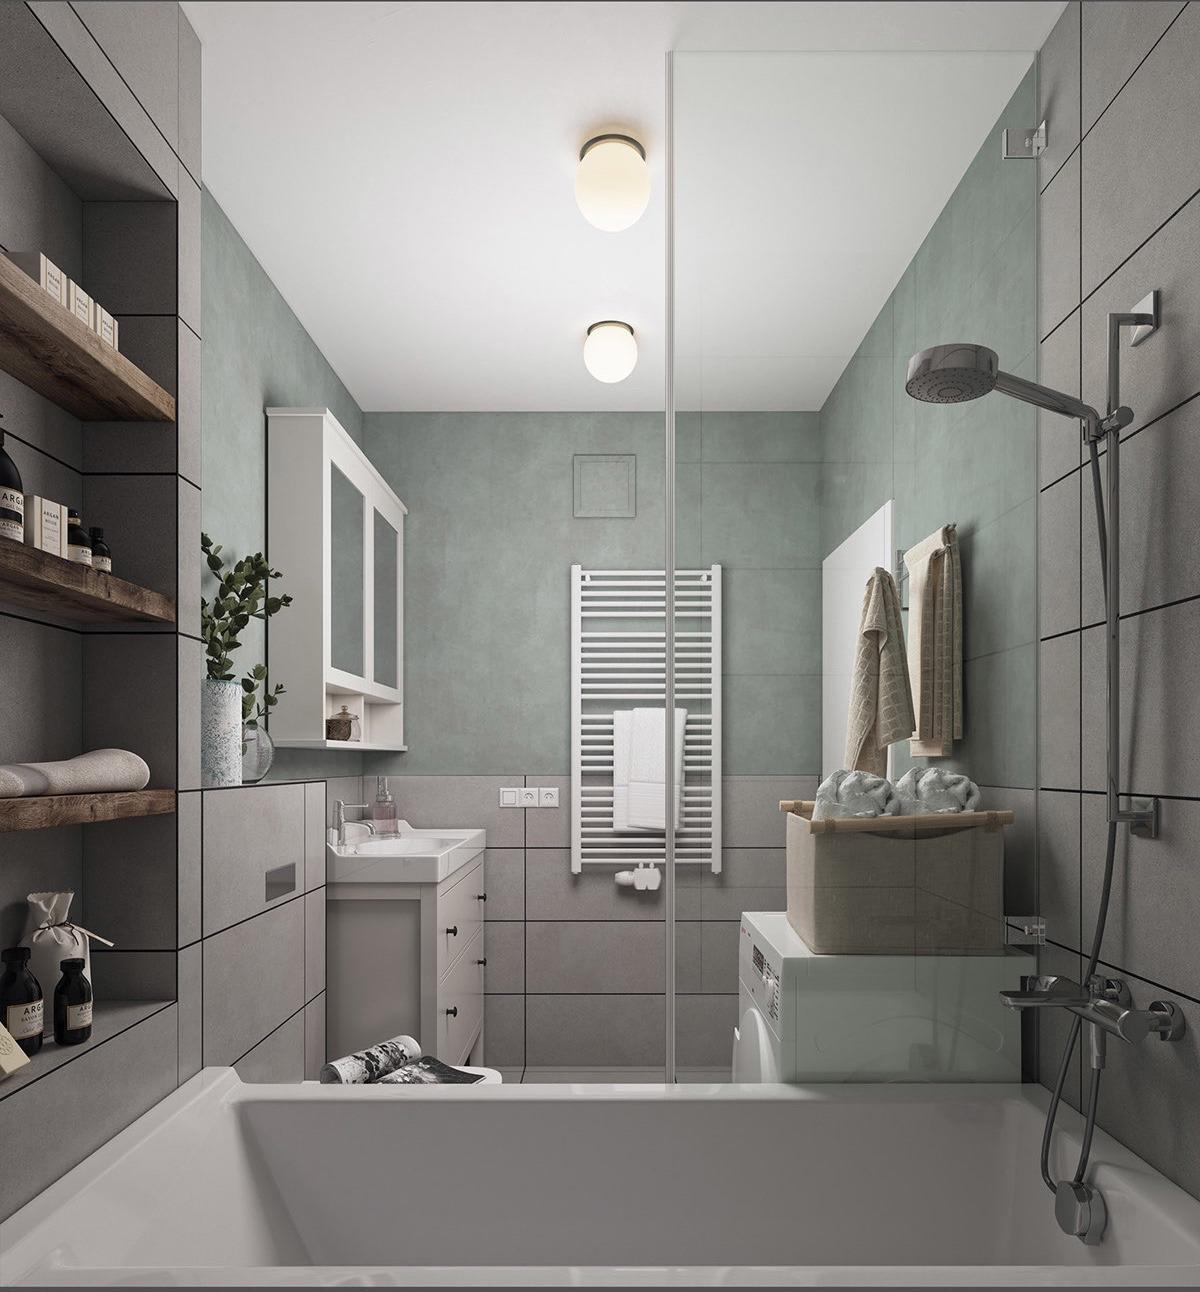 simple bathroom decorating iddeas